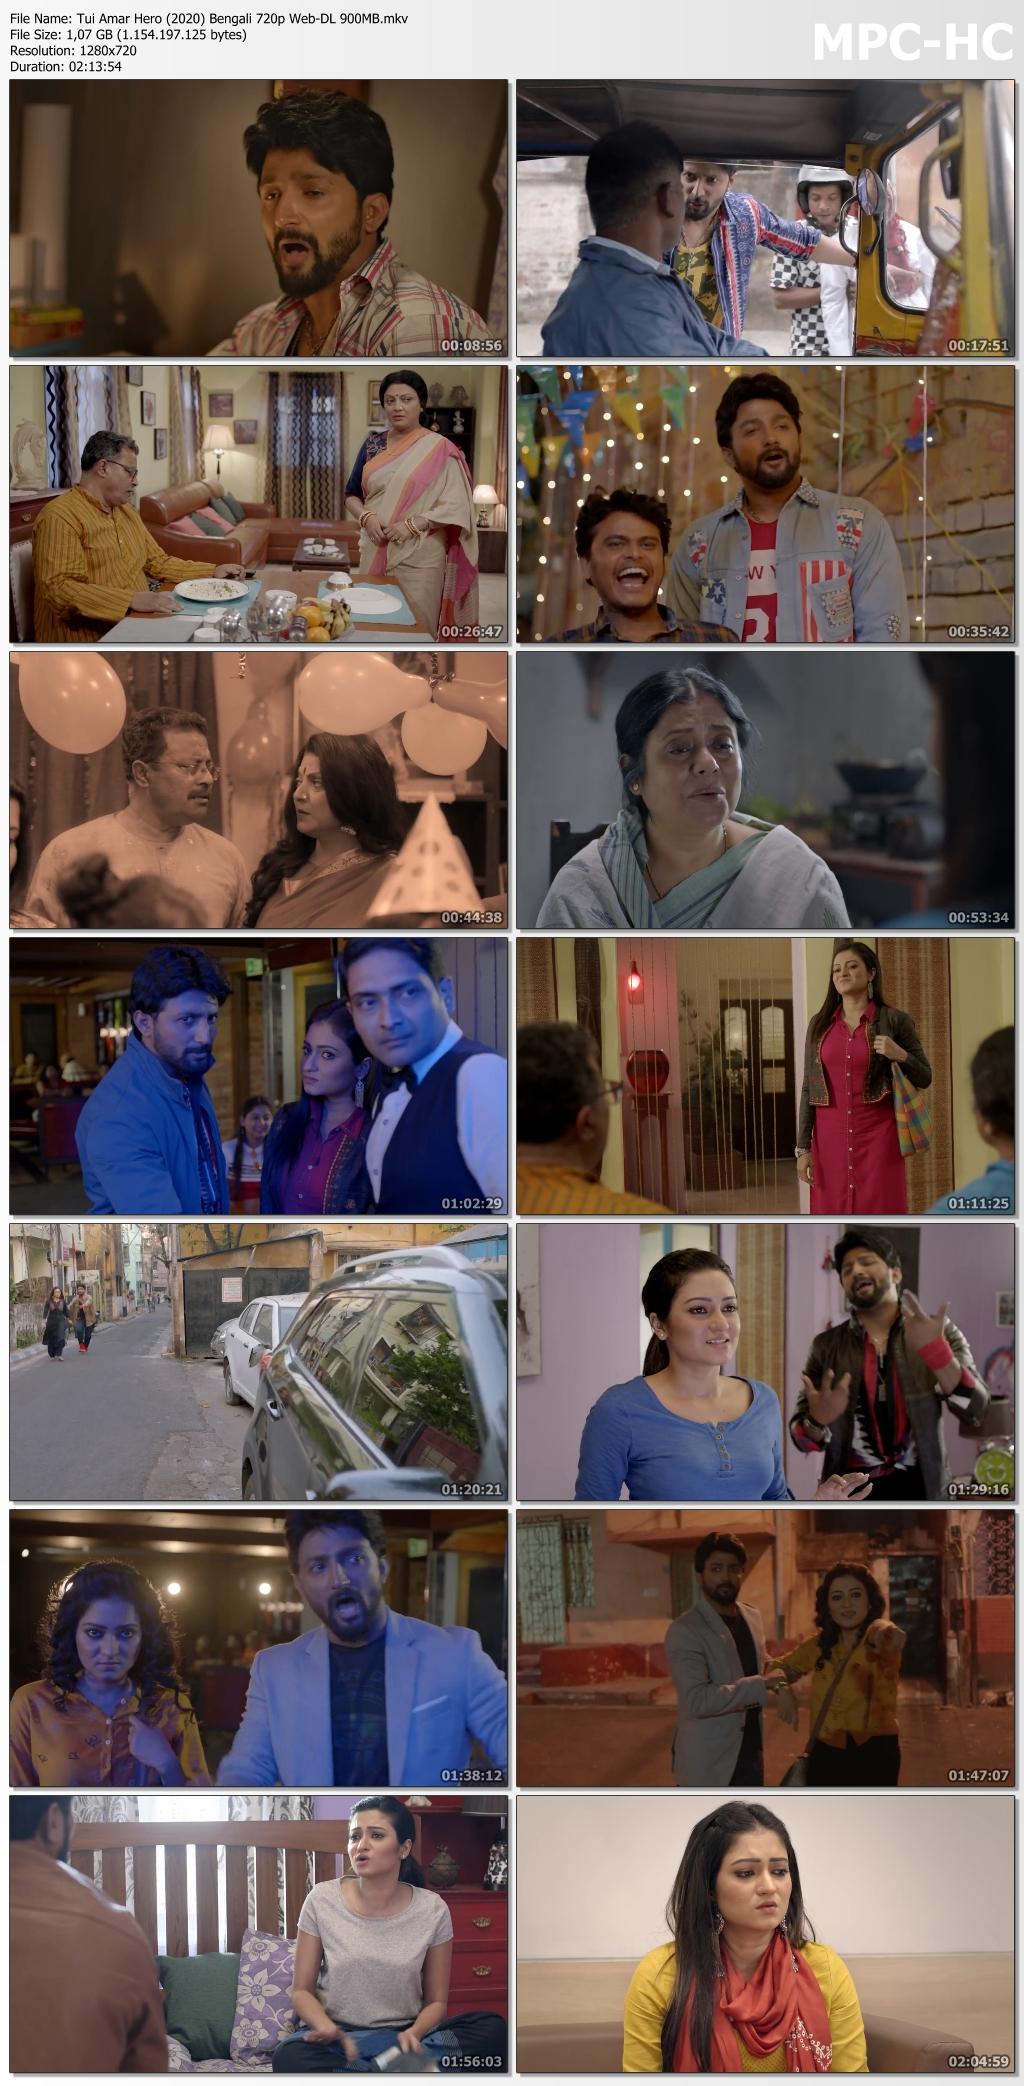 Tui-Amar-Hero-2020-Bengali-720p-Web-DL-900-MB-mkv-thumbs